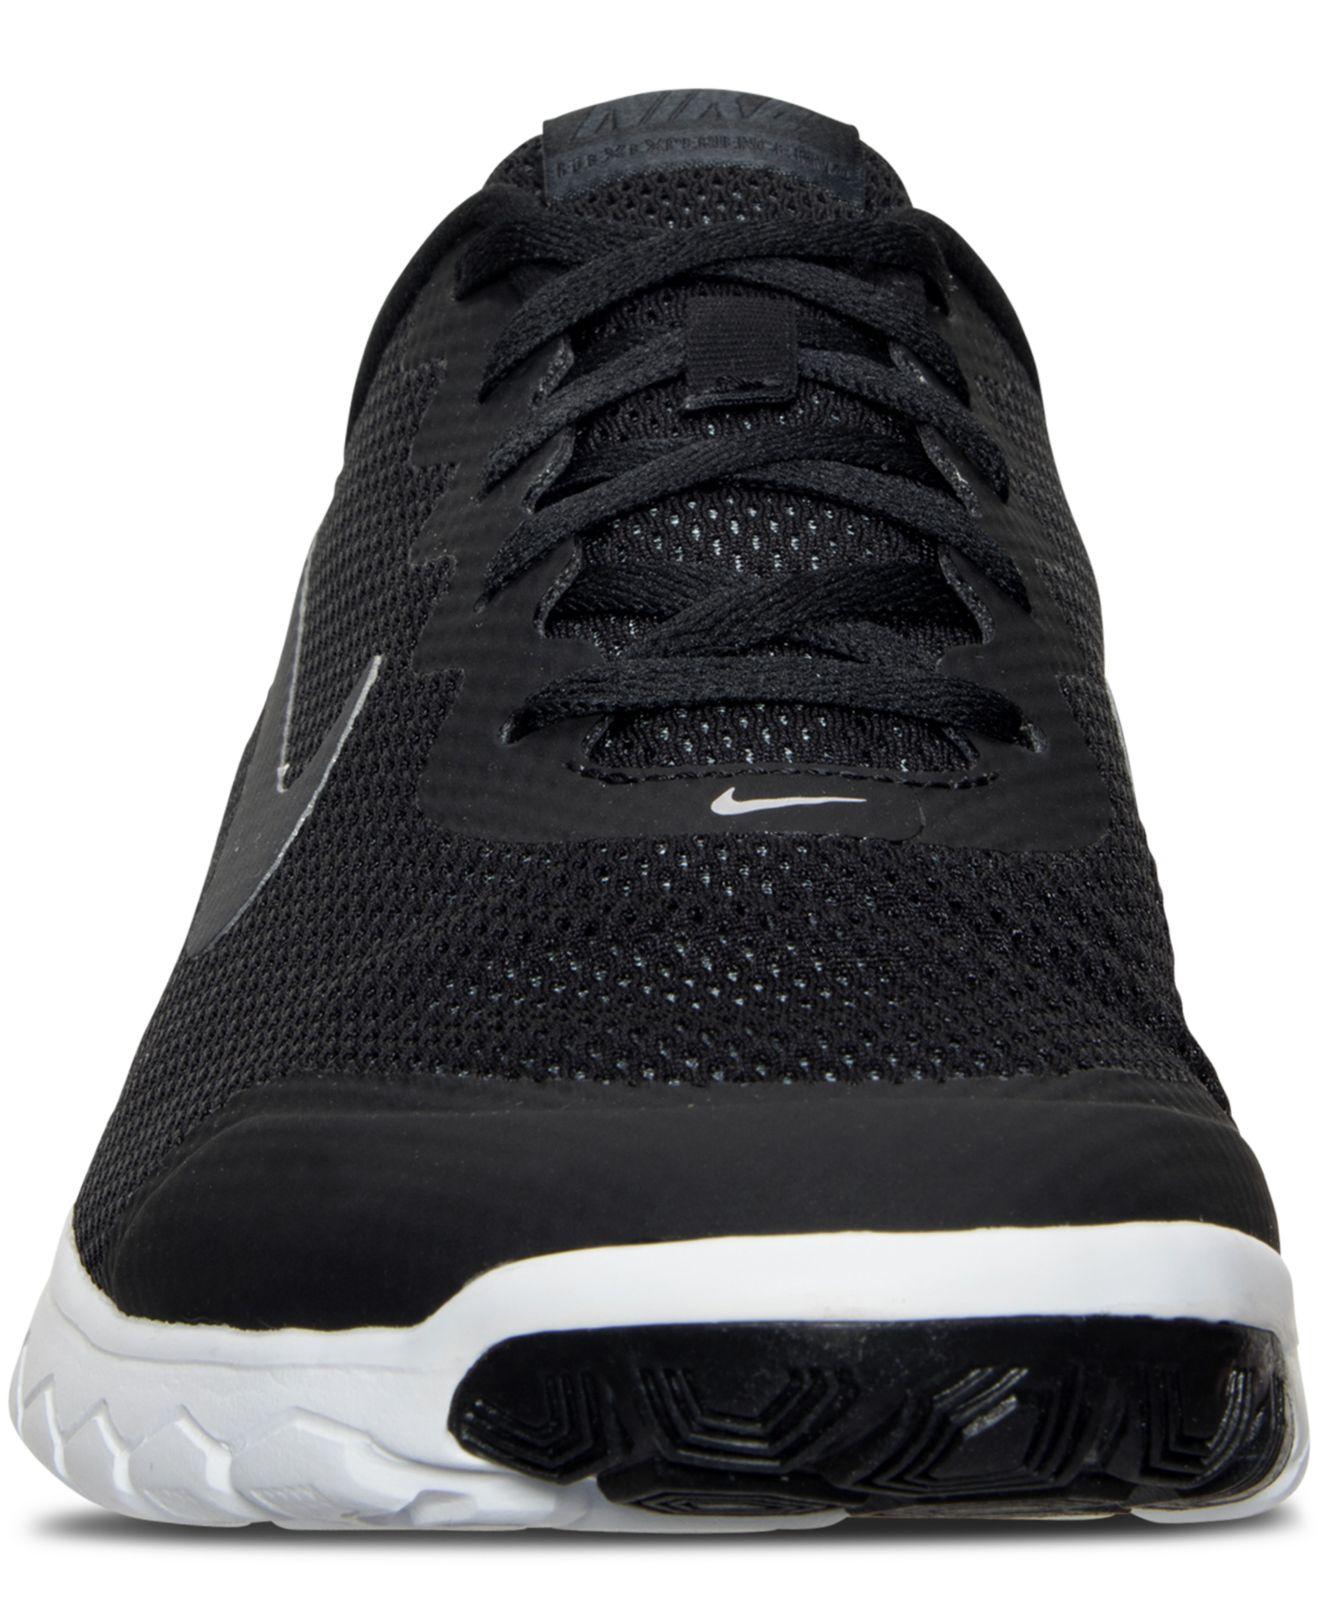 Lyst - Nike Men s Flex Experience Run 4 Wide Width Running Sneakers ... acd1adee1